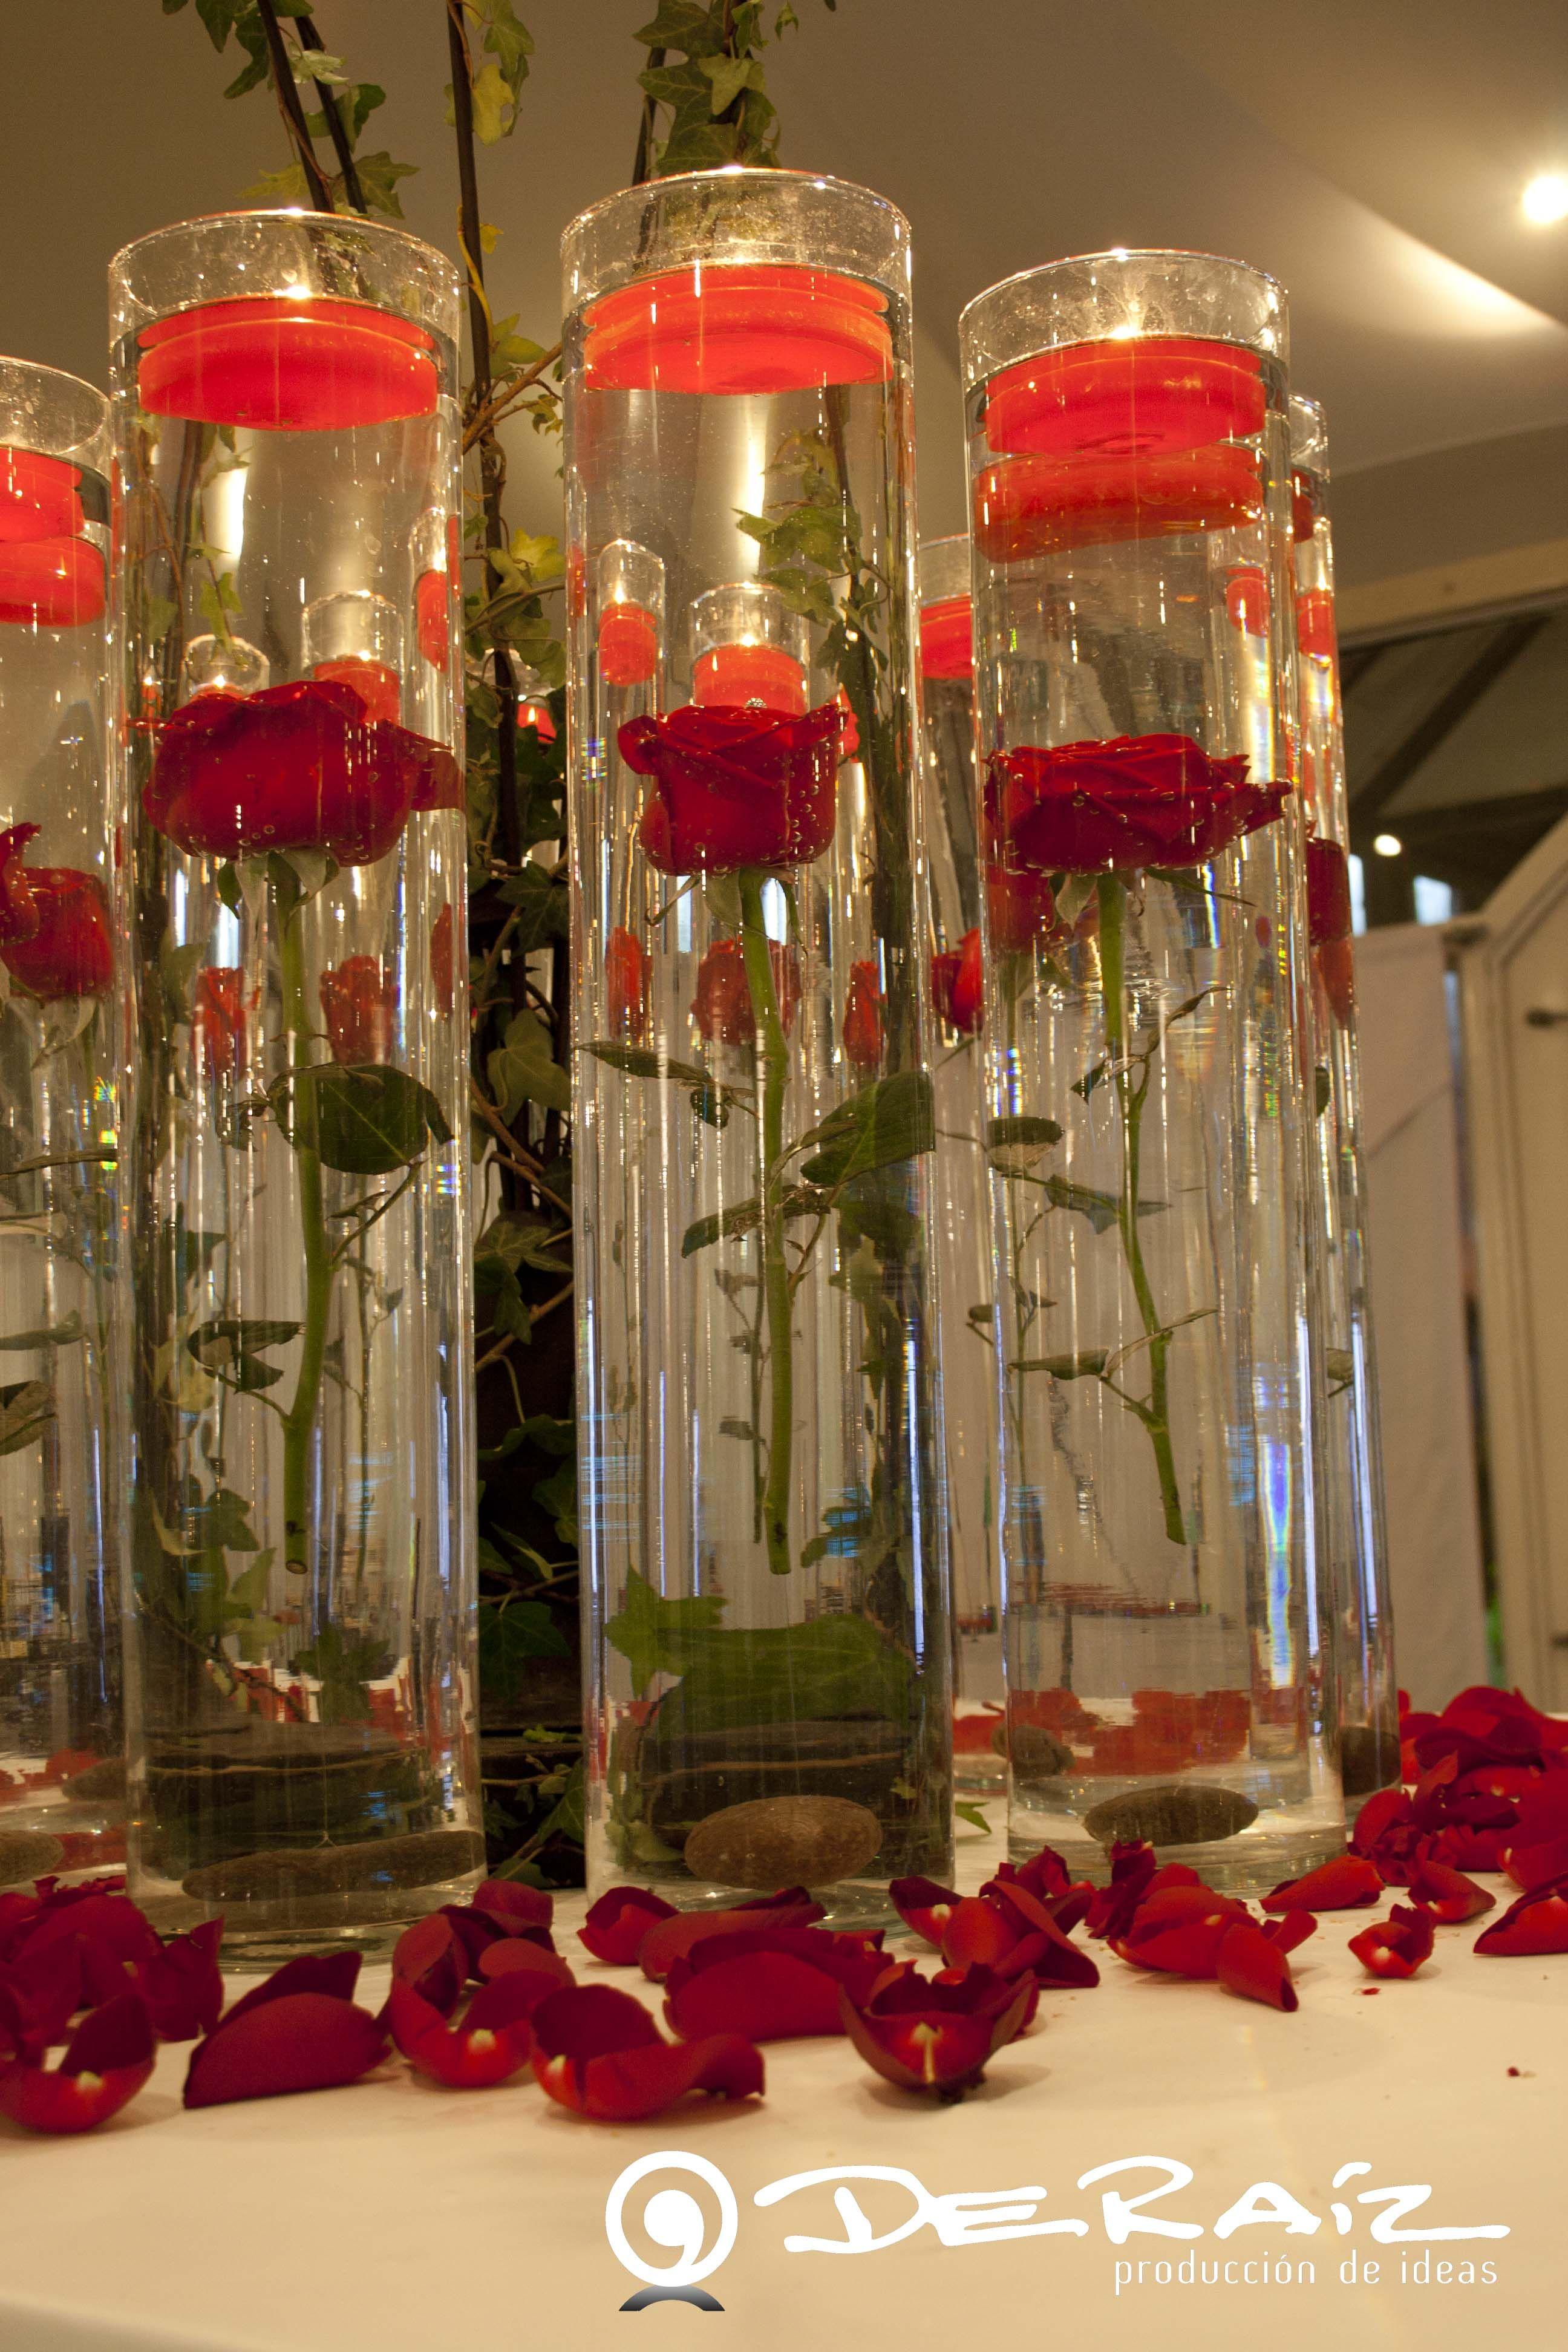 Rosas rojas sumergidas